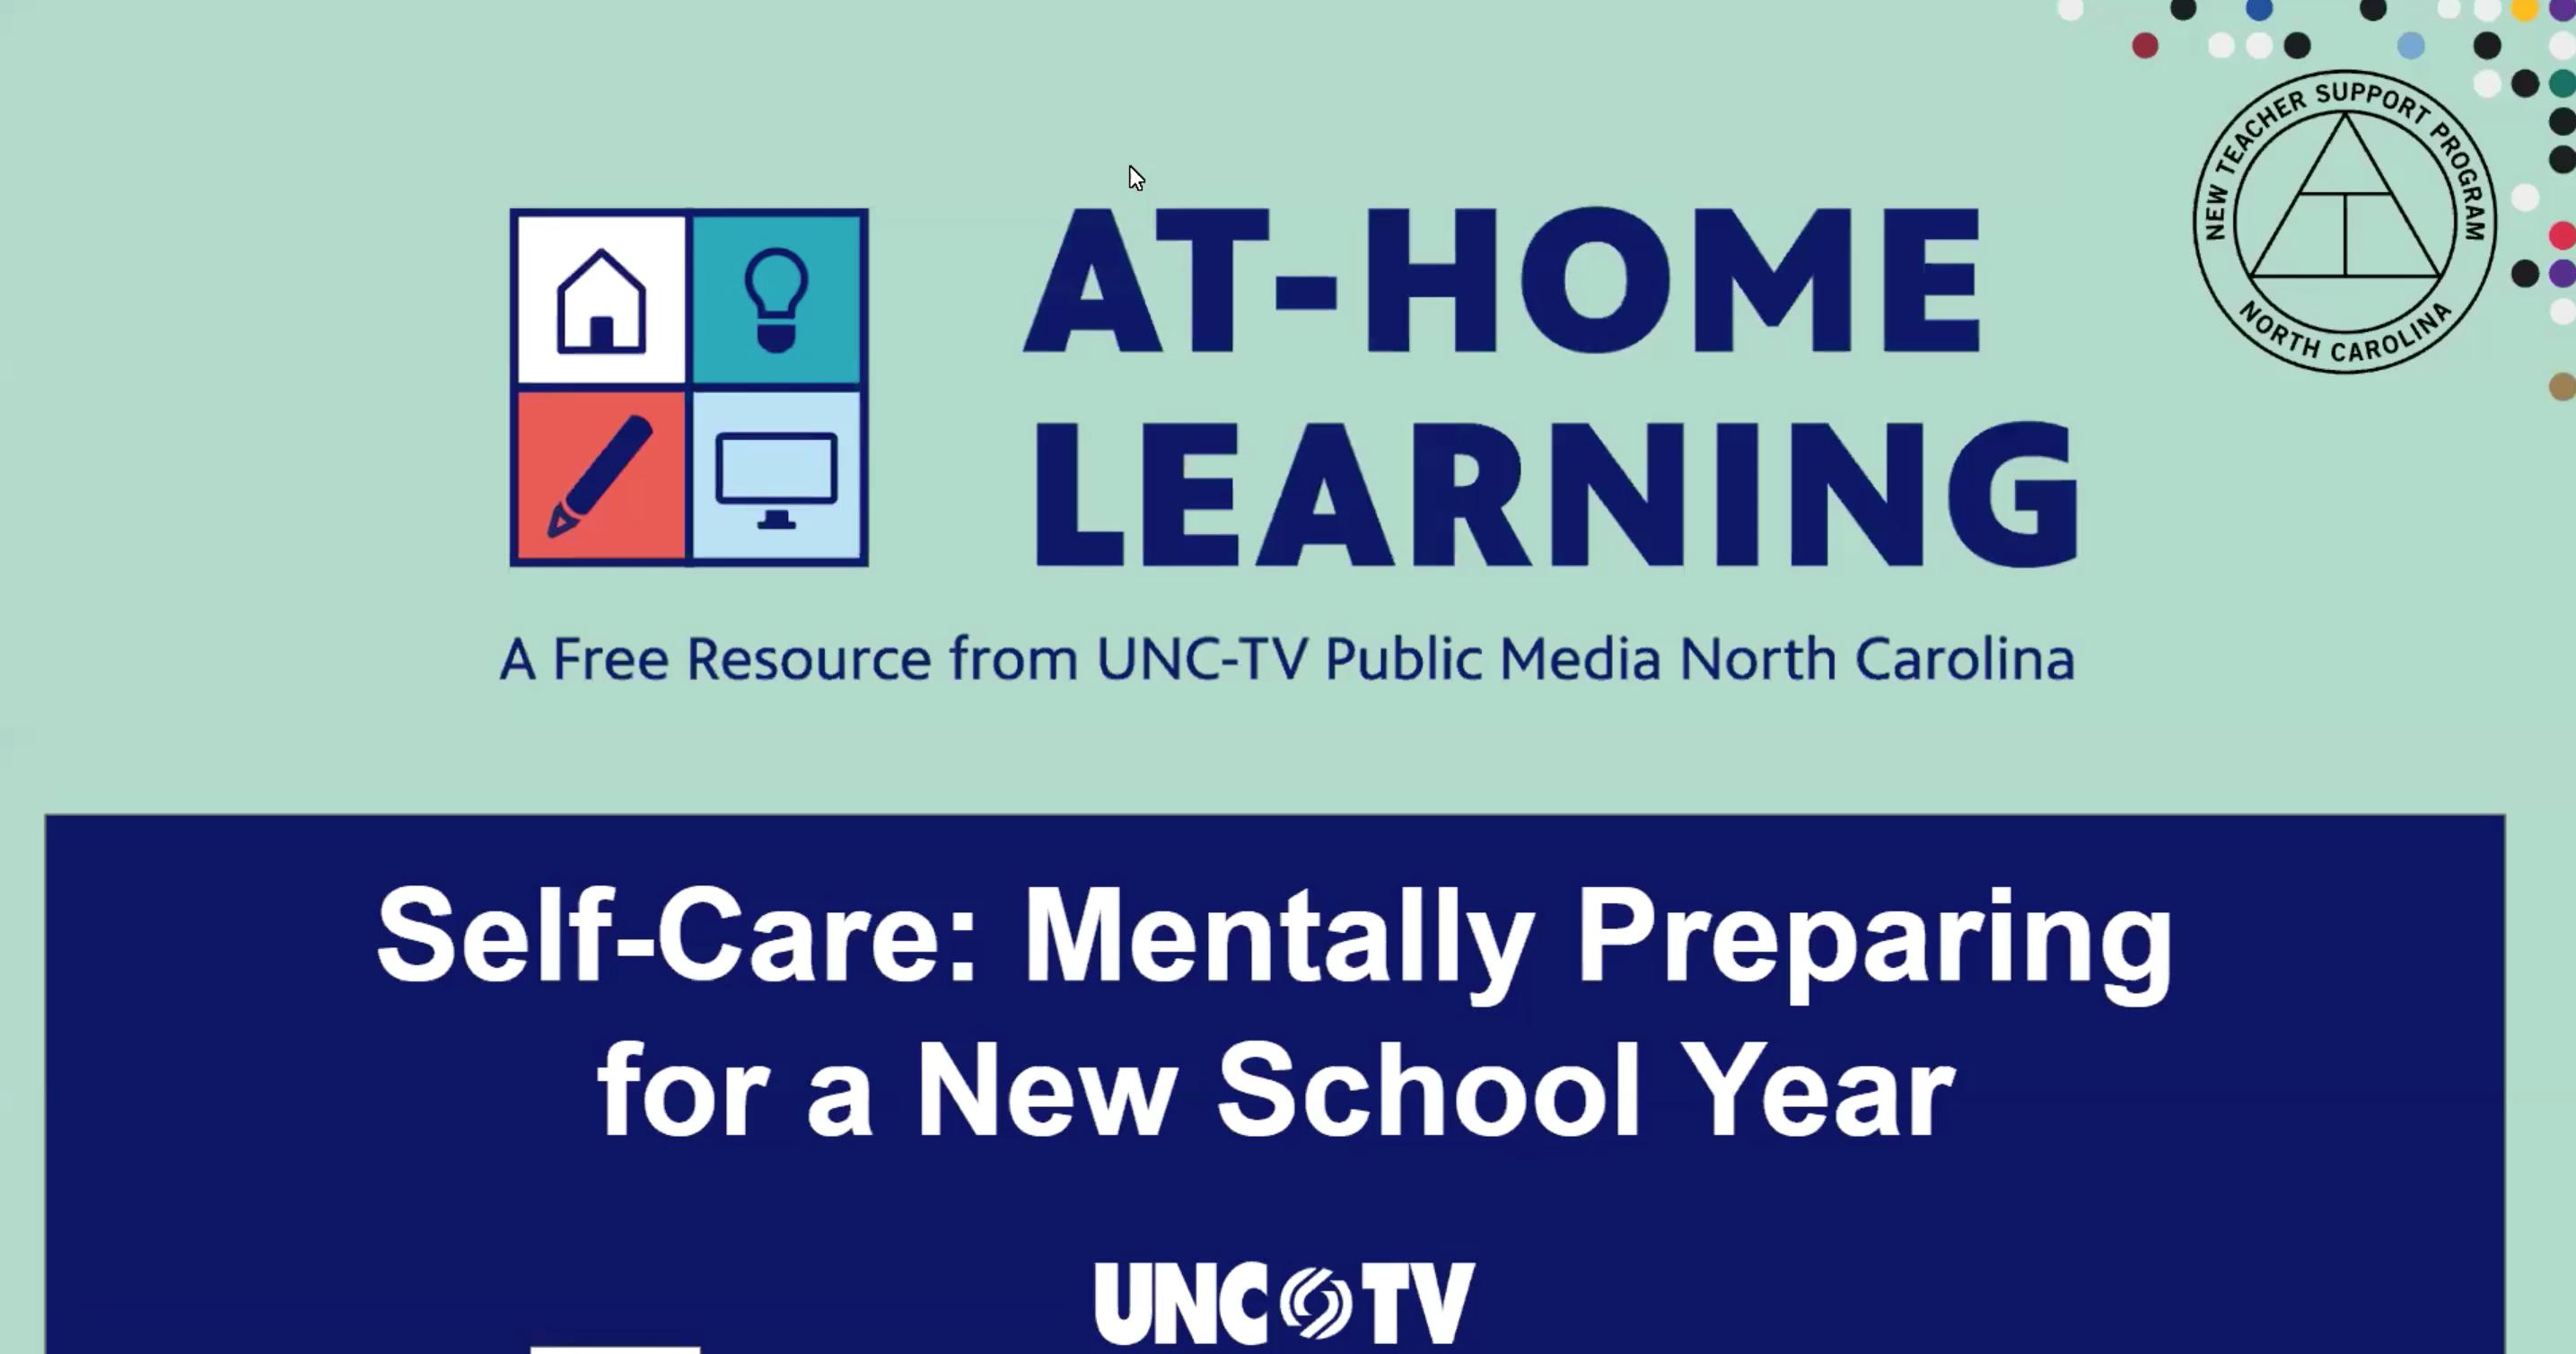 AHL Webinar: Self-Care (Preparing for a New School